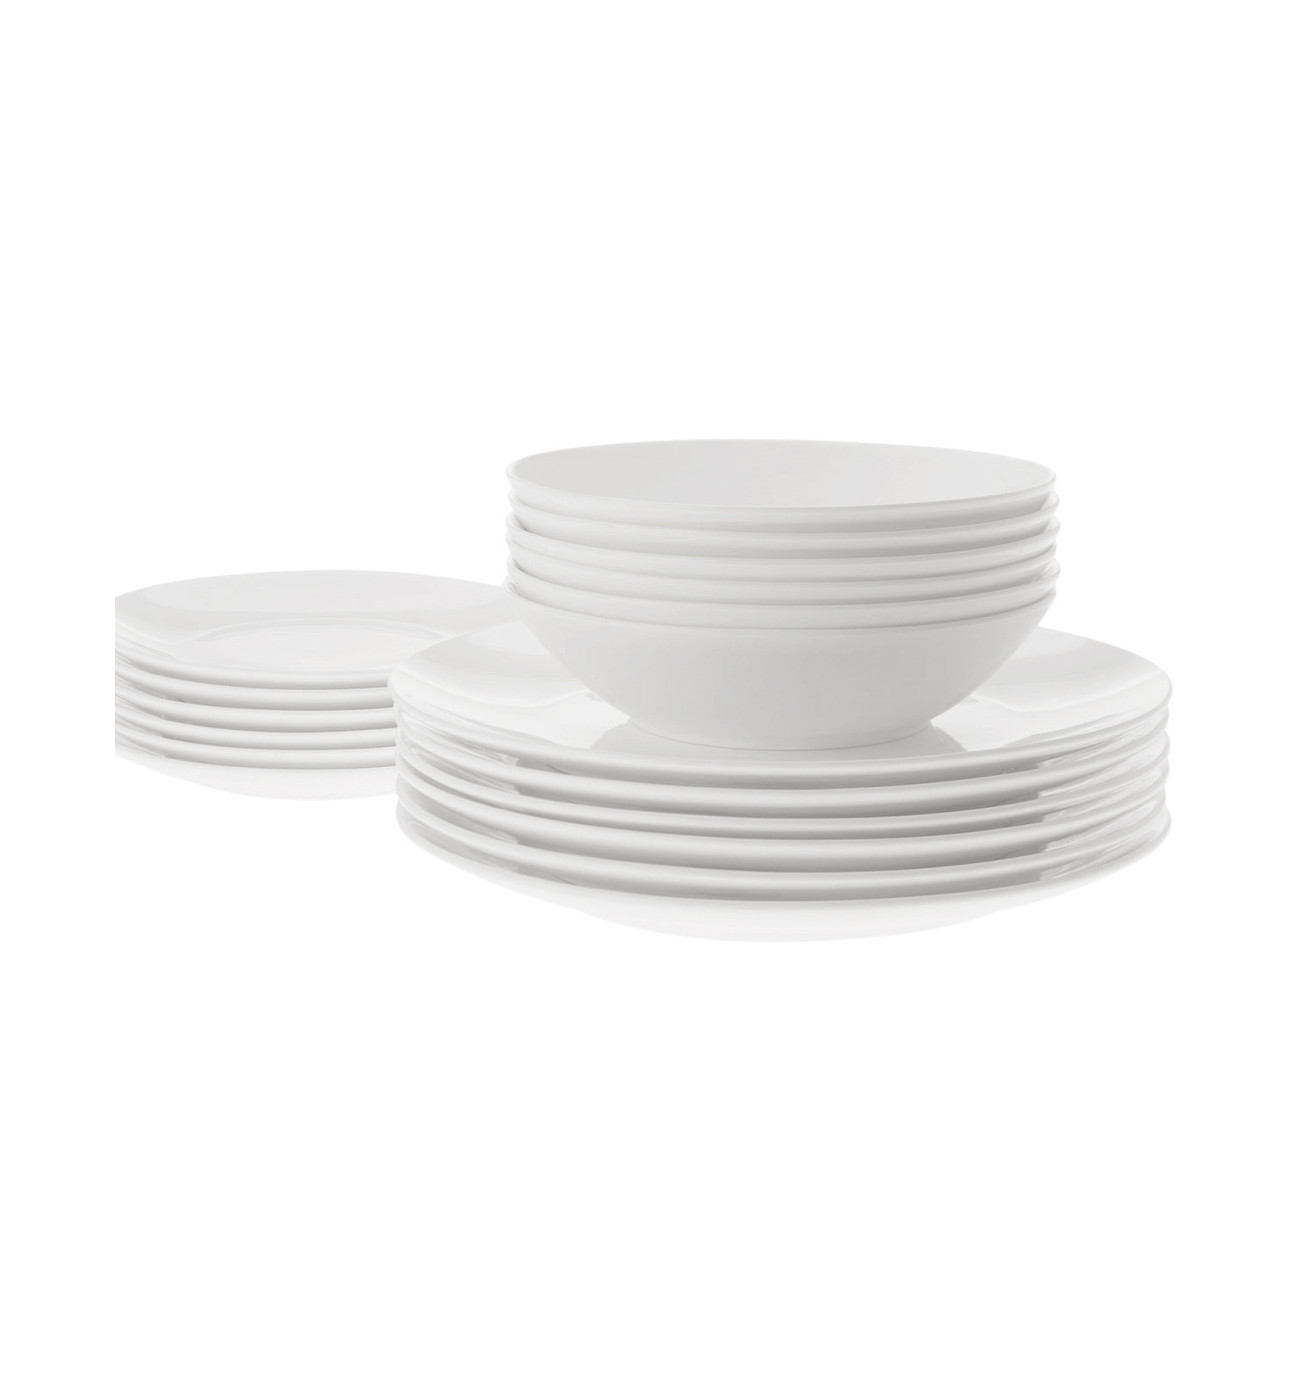 Cashmere Bone China Coupe 18-Piece Dinner Set  sc 1 st  David Jones & Dinner Sets | Servingware | Dinnerware Online | David Jones